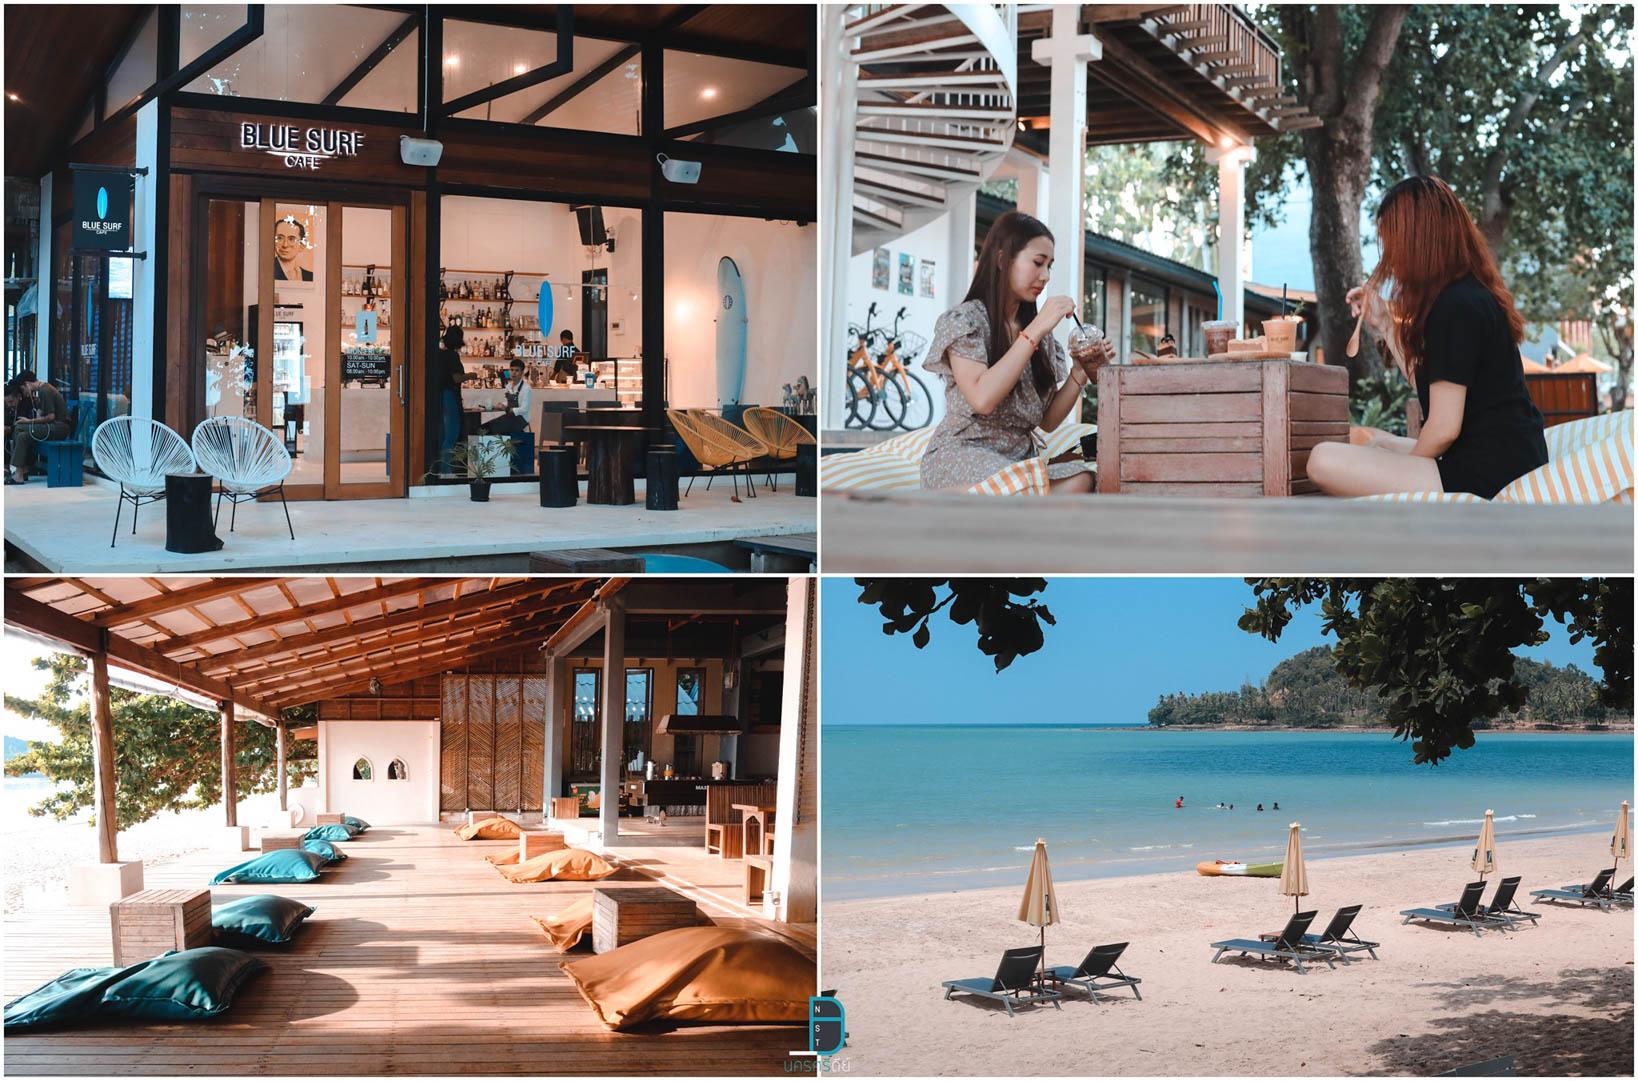 2.-Blue-surf-Cafe คลิกที่นี่ คาเฟ่,Cafe,นครศรีธรรมราช,2020,2563,ของกิน,จุดเช็คอิน,จุดถ่ายรูป